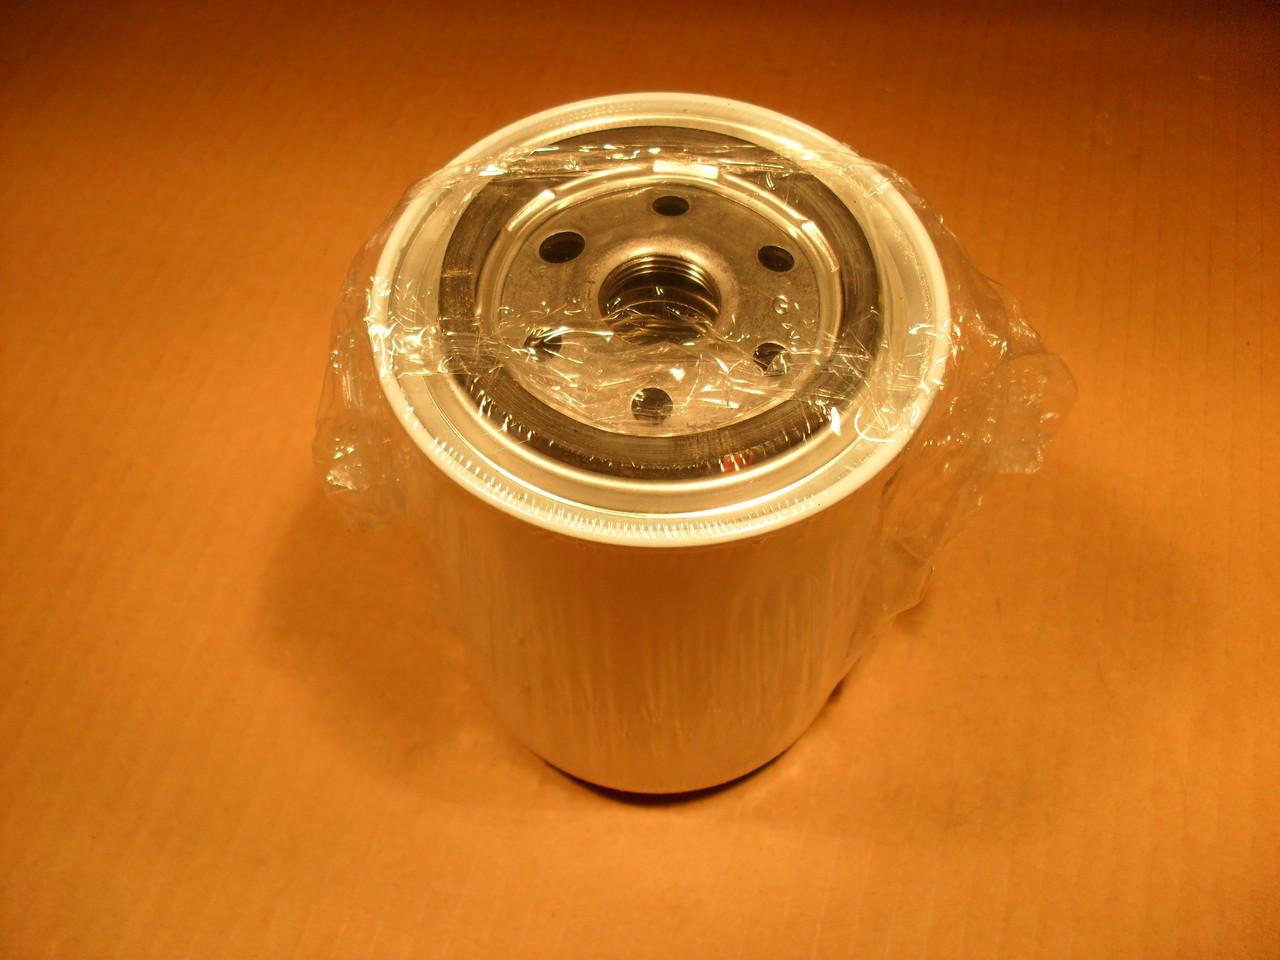 oil filter for vermeer flextrak 75 m455a m475a t450 t455 v450 [ 1280 x 960 Pixel ]